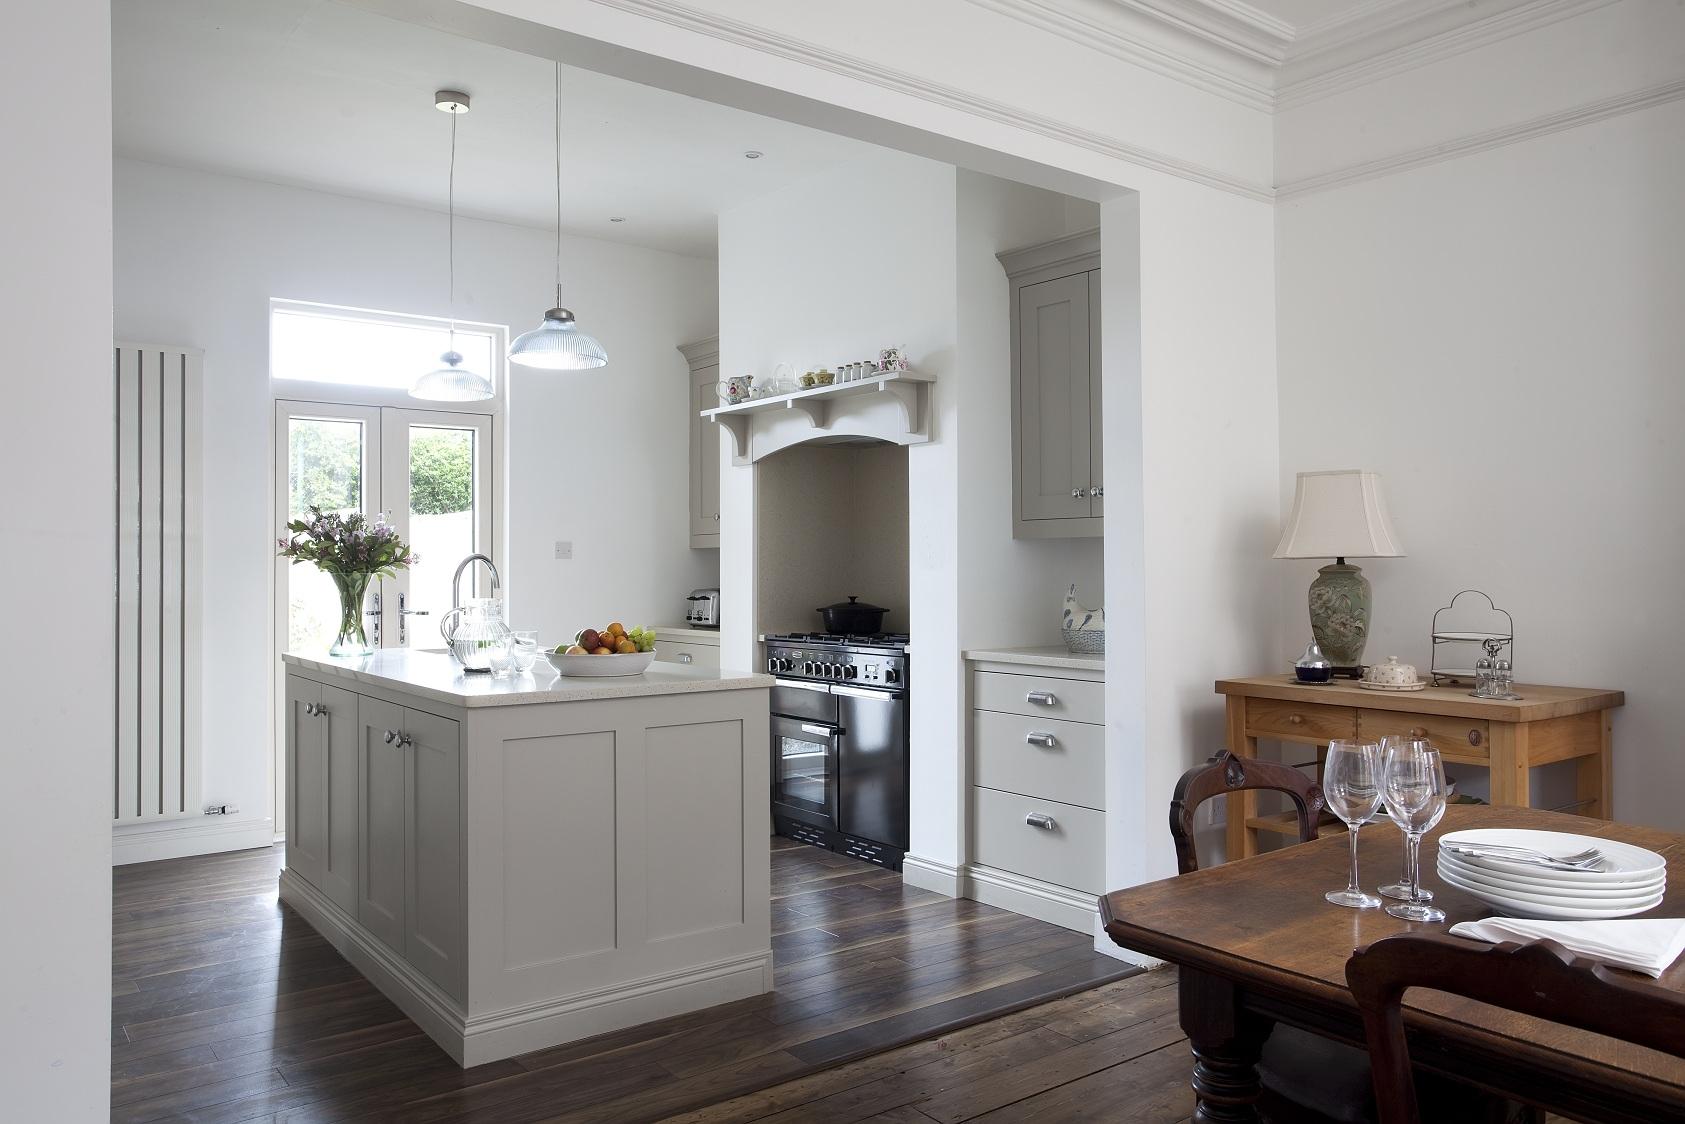 free standing kitchen cabinets appliance plain english design - ireland — noel dempsey